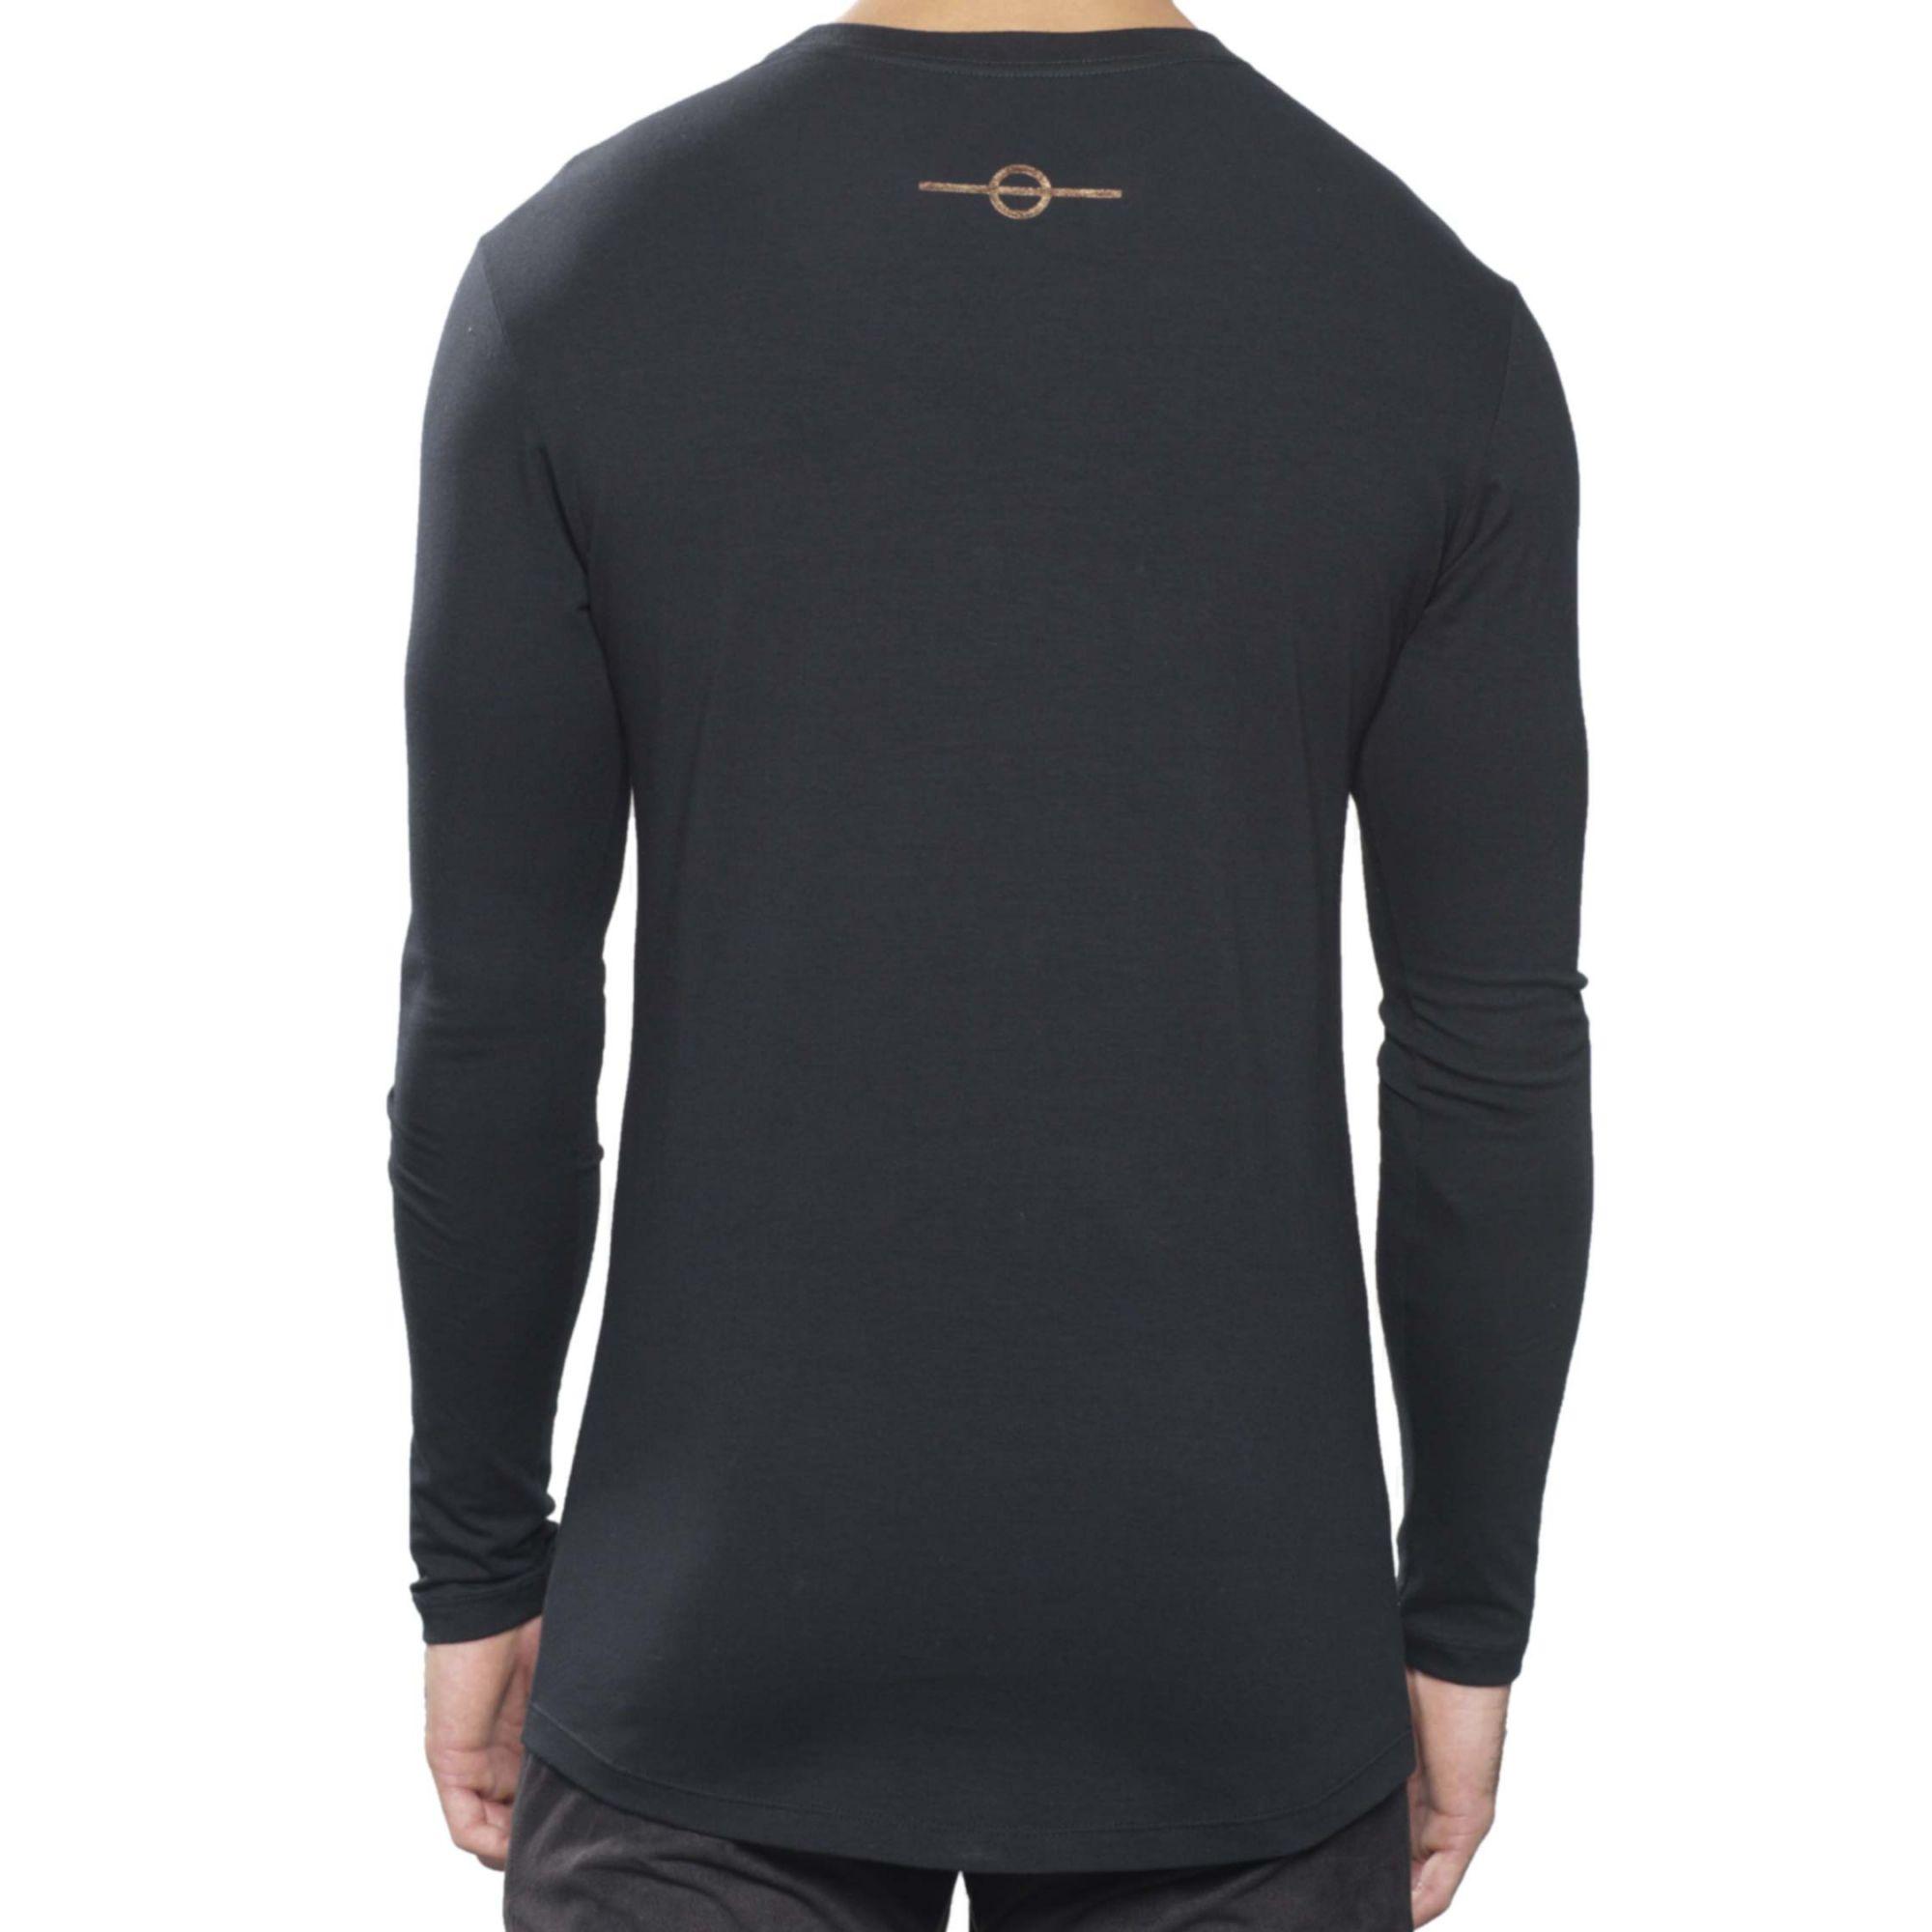 Camiseta Buh Manga Longa Tachas Black